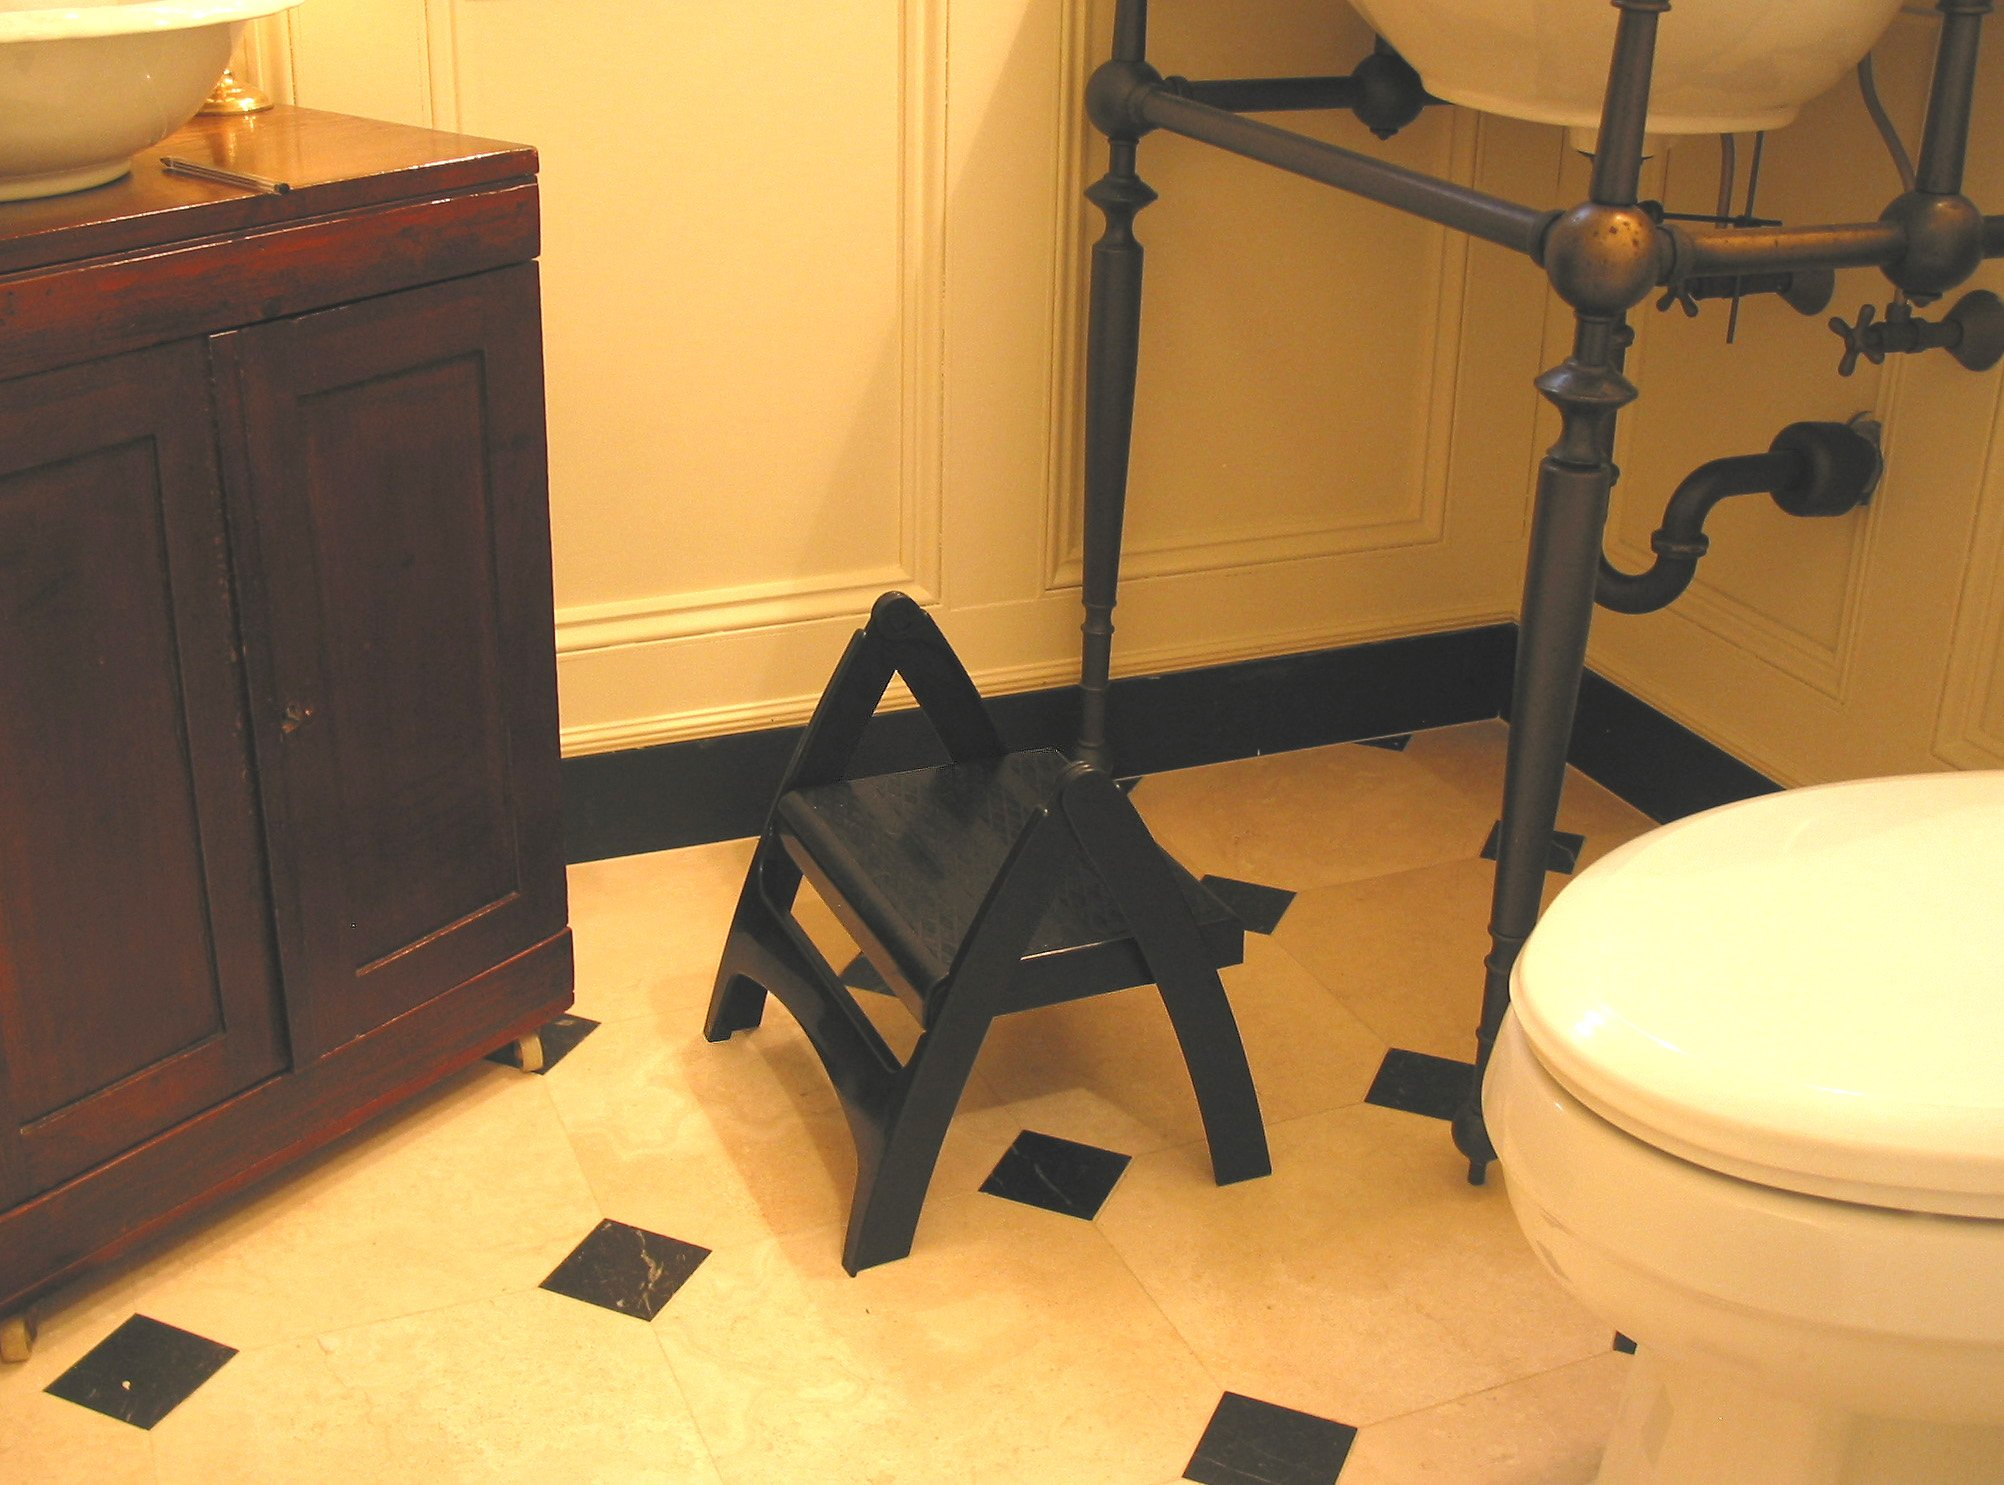 Adams Manufacturing 8530-02-3731 Quik-Fold Step Stool, Black by Adams Manufacturing